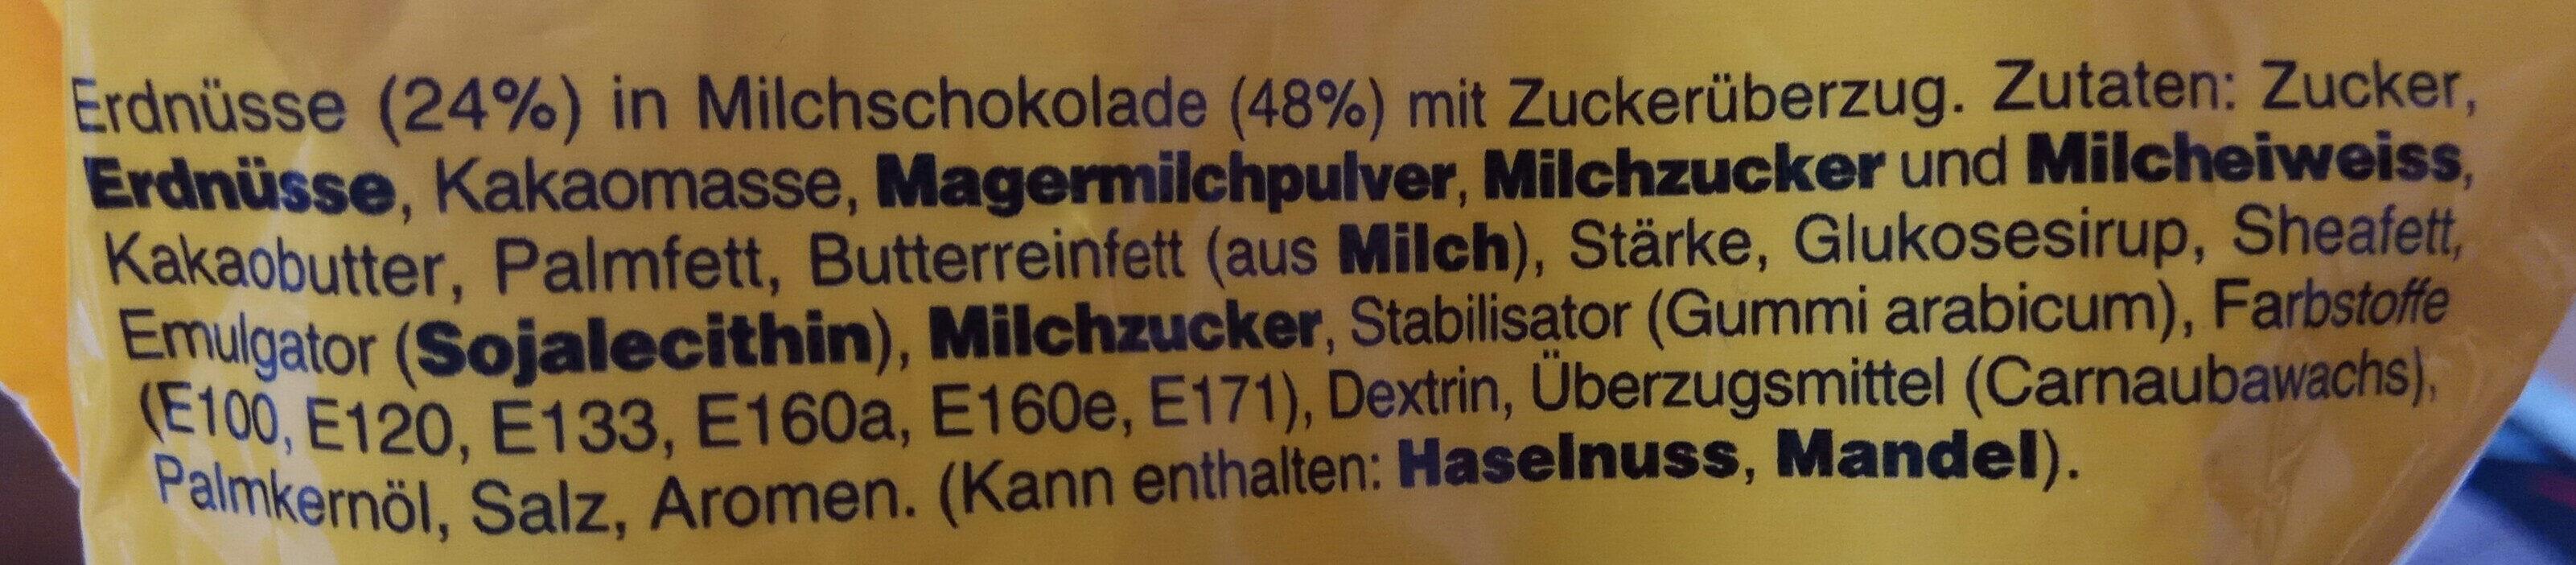 M&m's peanut - Zutaten - de